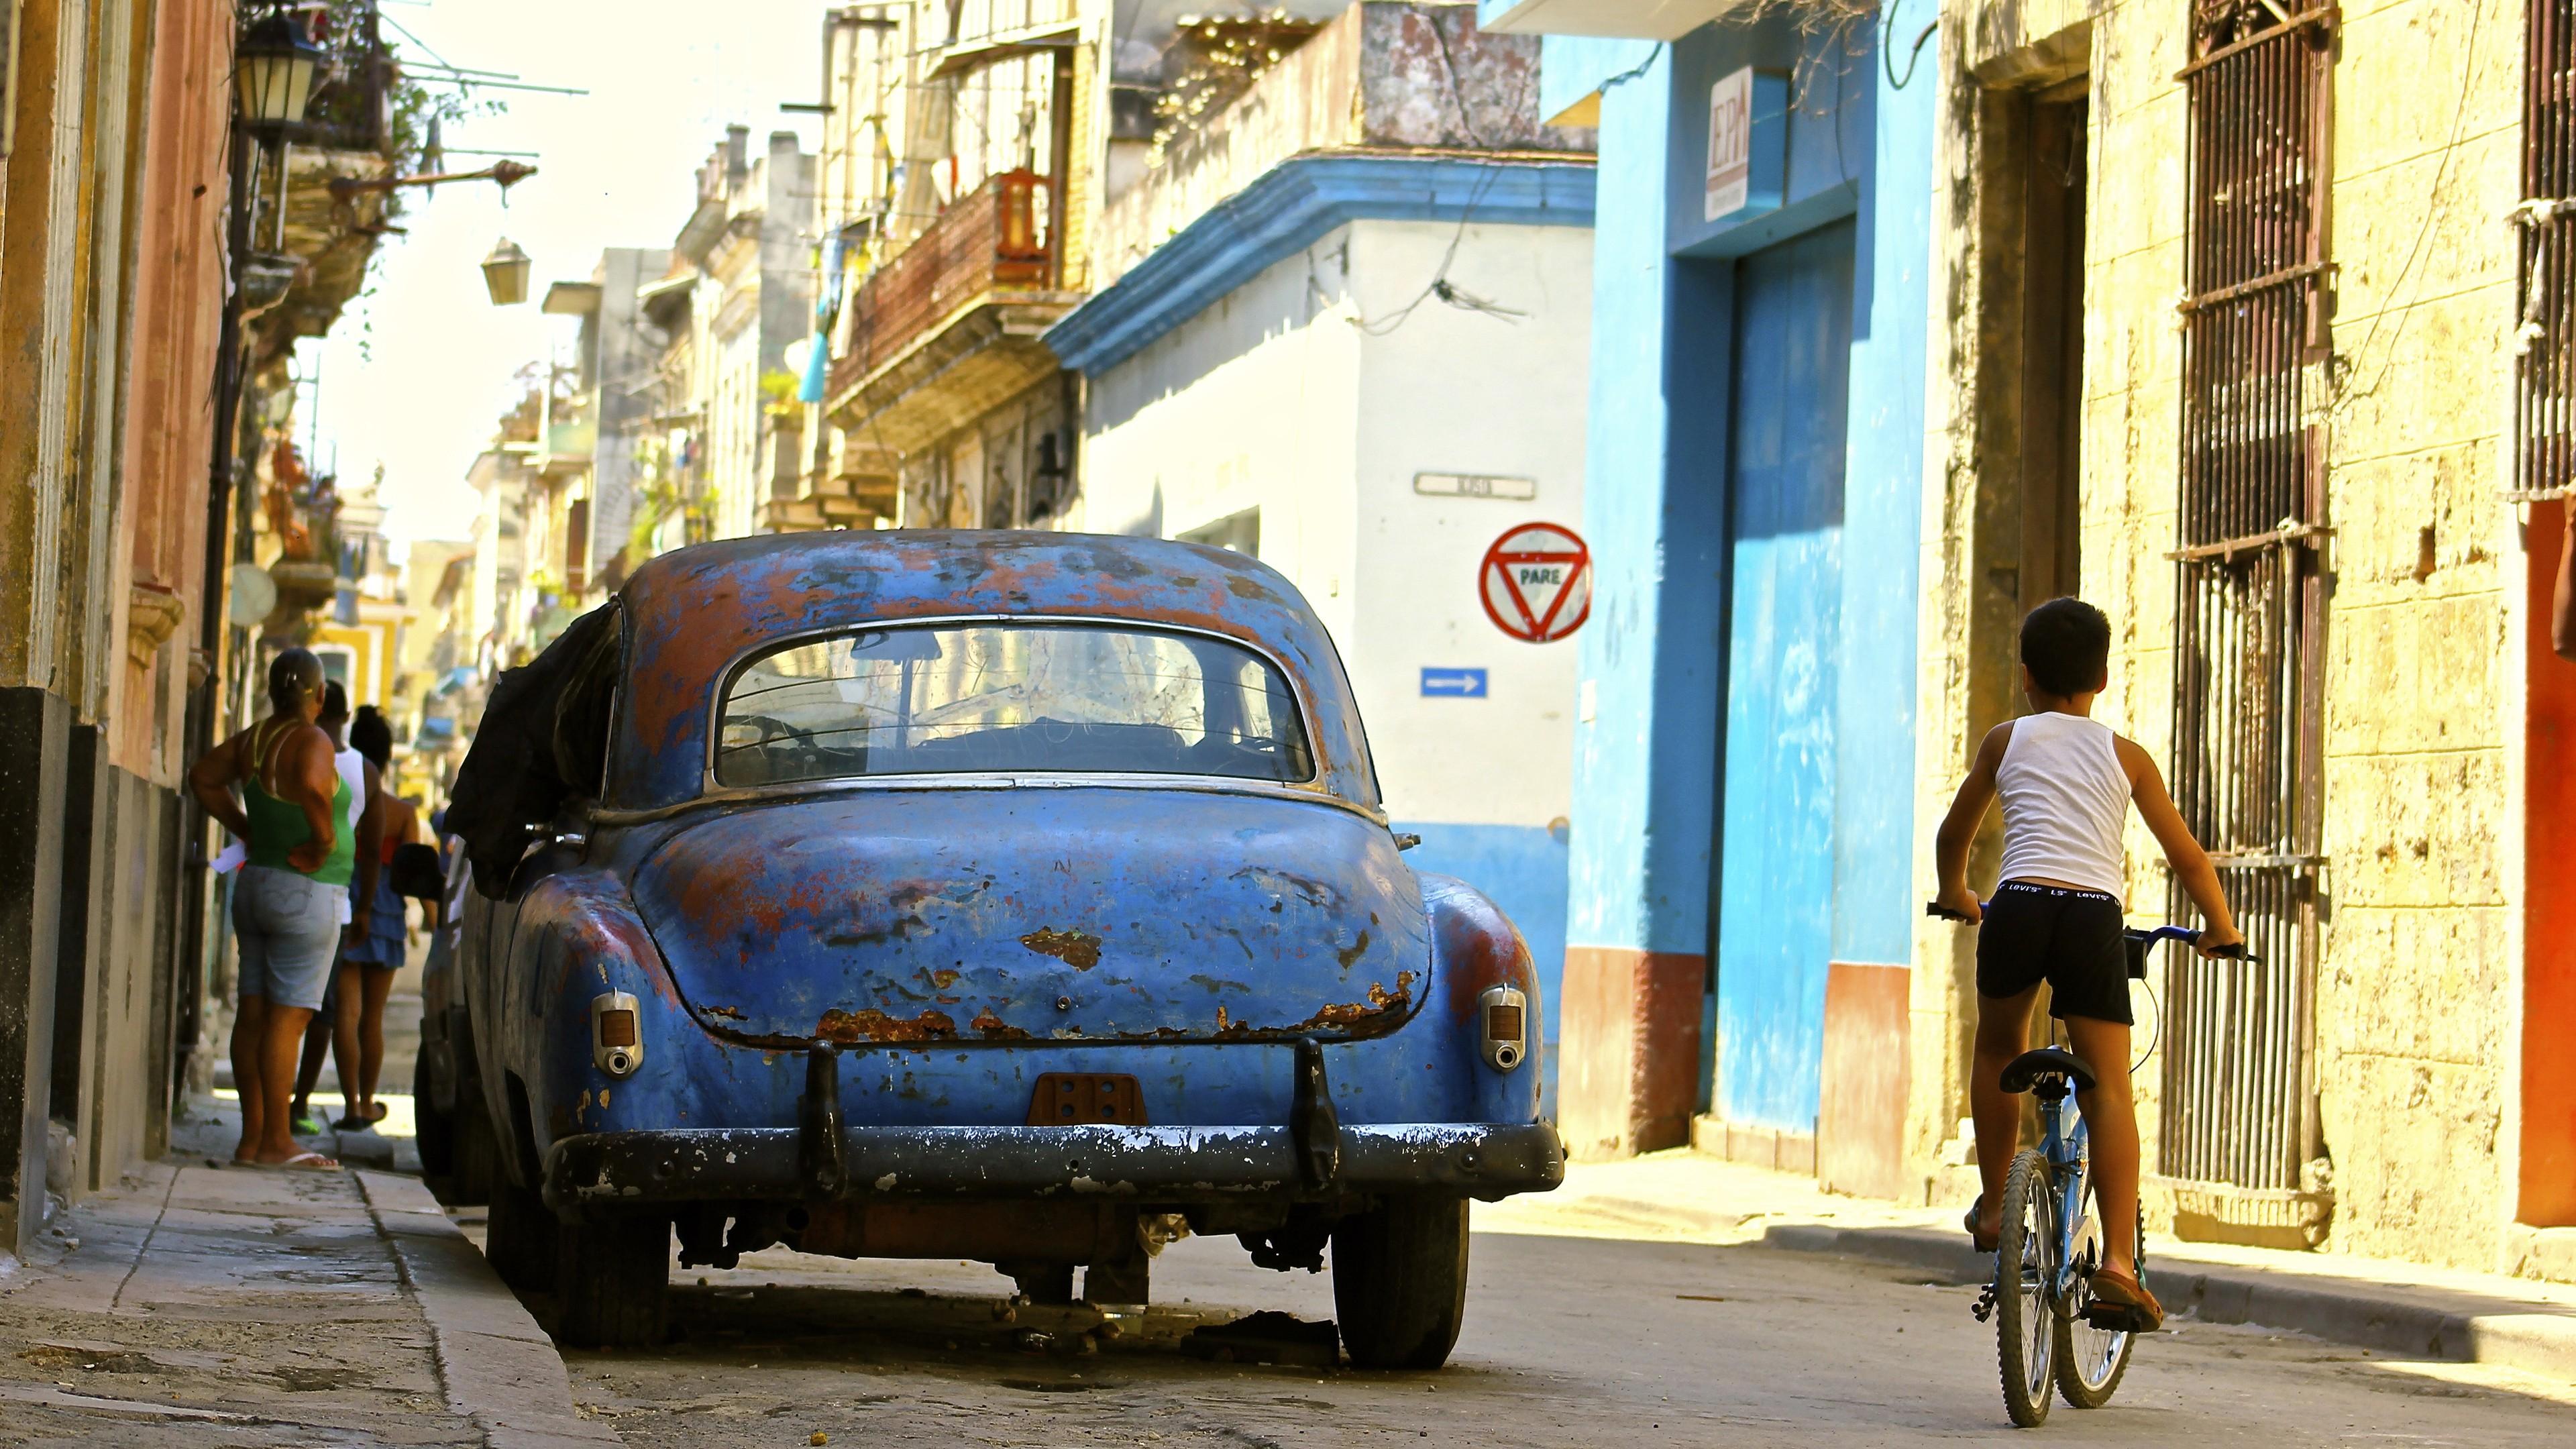 General 3840x2160 Cuba Havana street car vehicle old people urban rust blue cars